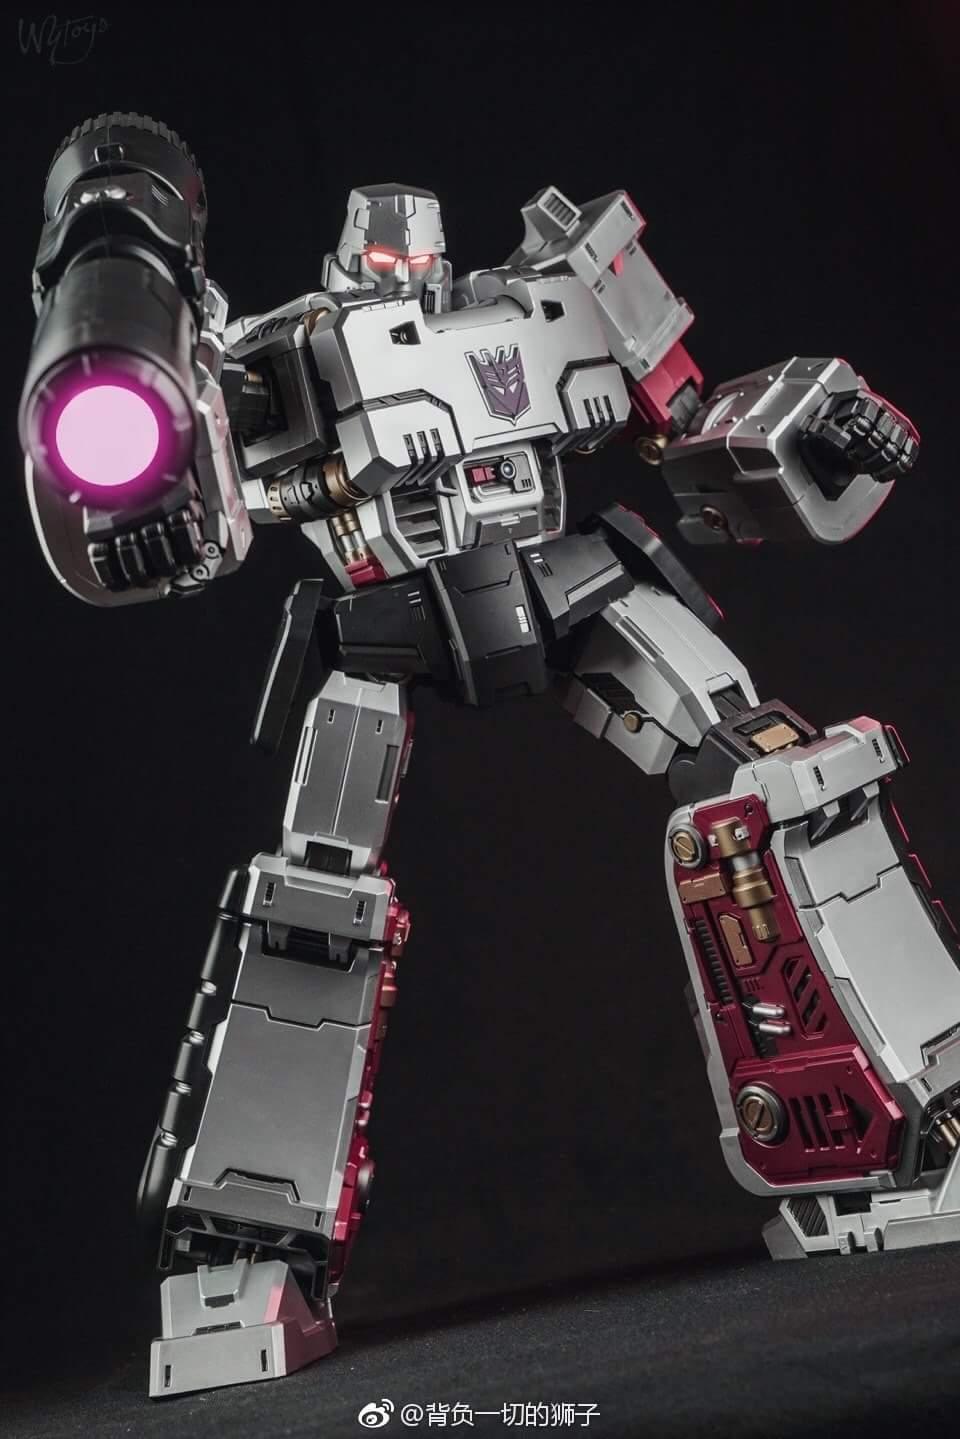 Figurines Transformers G1 (articulé, non transformable) ― Par 3A, Action Toys, Fewture, Toys Alliance, Sentinel, Kotobukiya, Kids Logic, Herocross, EX Gokin, etc - Page 6 QydMqTdQ_o